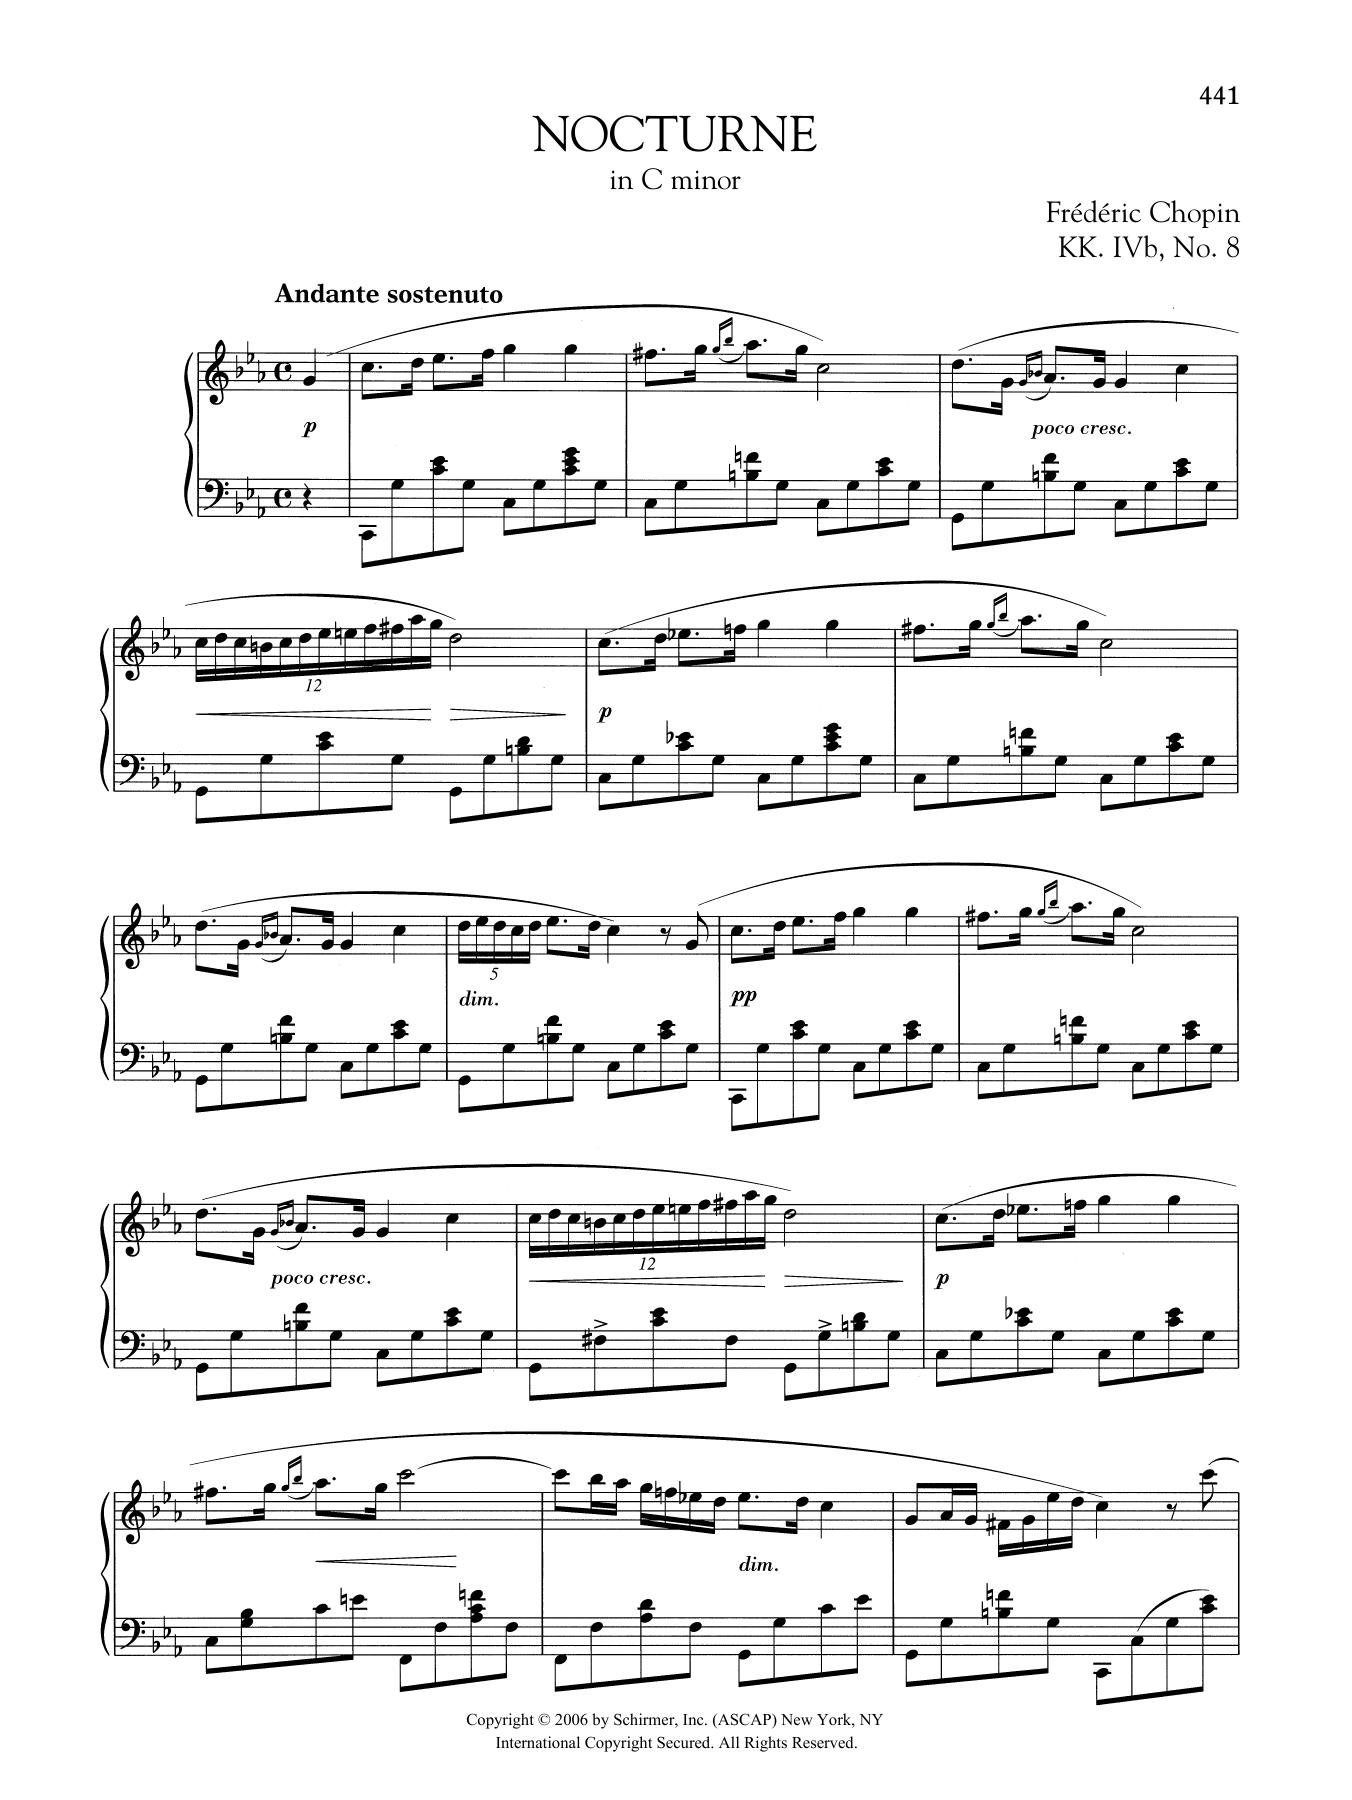 Nocturne In C Minor Kk Ivb No 8 At Stanton S Sheet Music